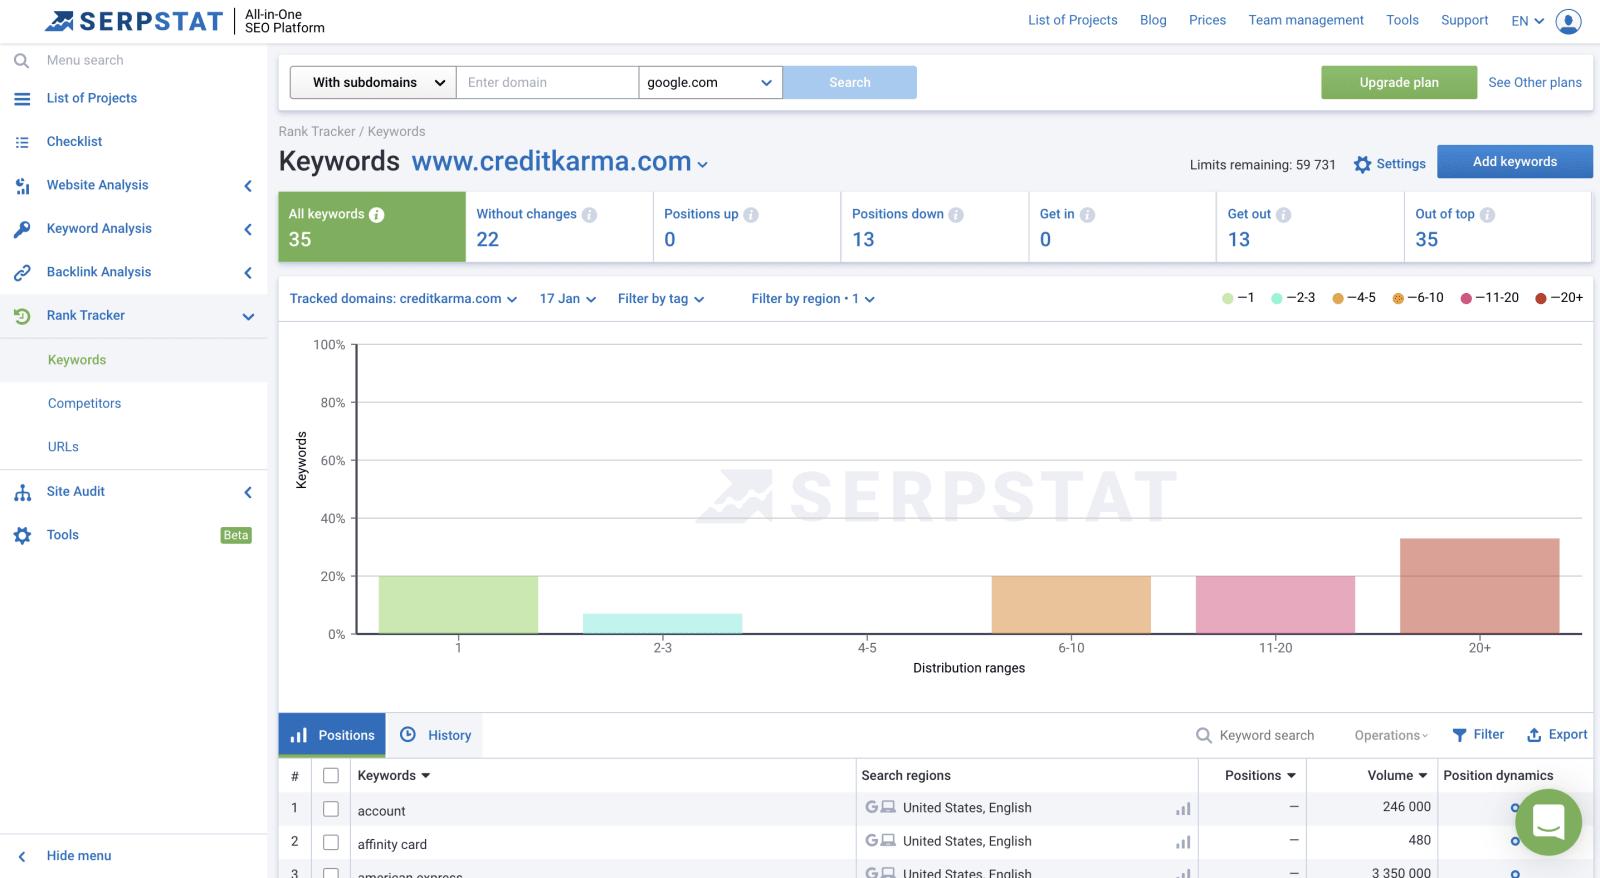 SEMrush vs Serpstat rank tracking